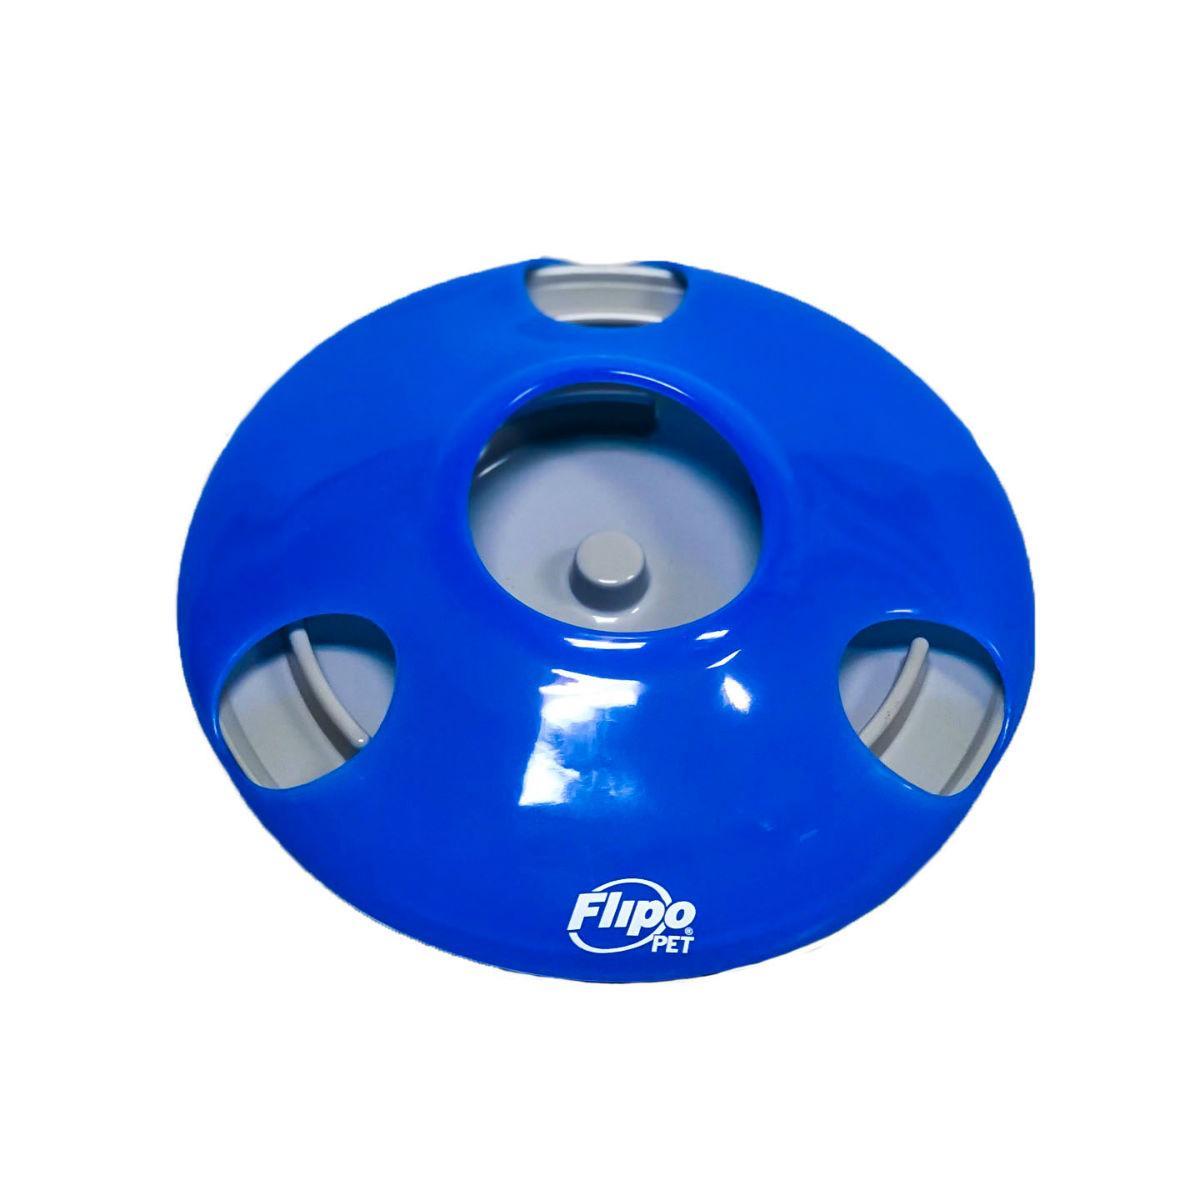 U.F.O. - Ultimate Feeding Object Pet Slow Feeder or Treat Dispenser - Blue